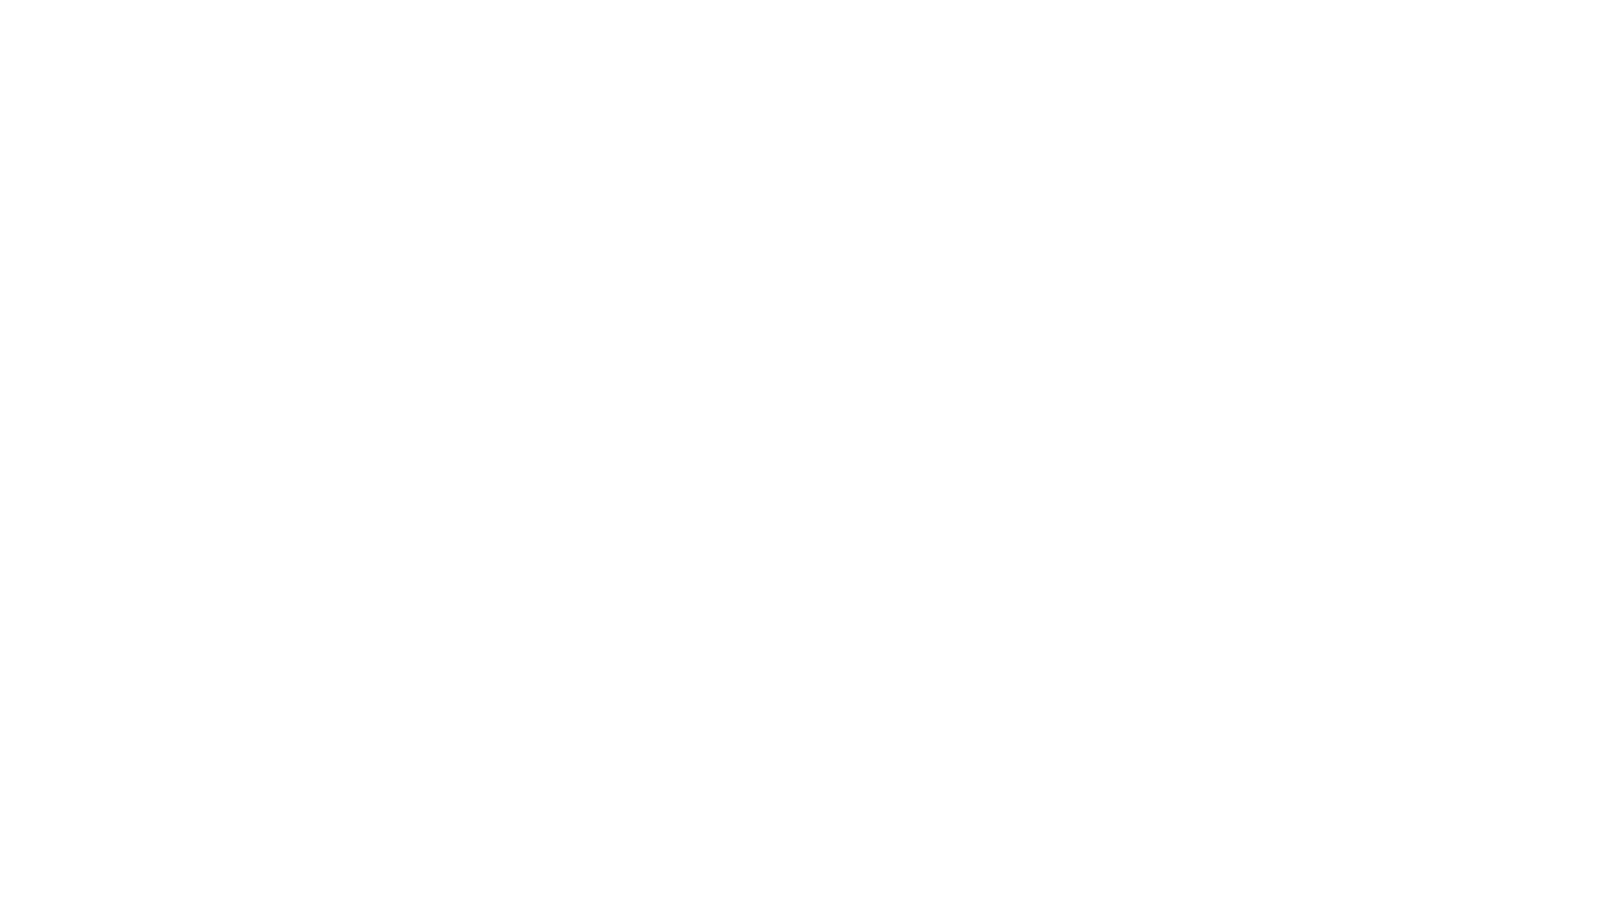 Liturgist: Sandra Long Music: The Lafayette Summer Choir Director of Music: J. David Williams  Sermon: The Rev. David F. Nunn-Telfort Bulletin:  bit.ly/LAPCBulletinAUG1st Link to Give: https://bit.ly/DonateLAPC Volunteer to join the LAPC Mutual Aid Network: bit.ly/LAPCHuman